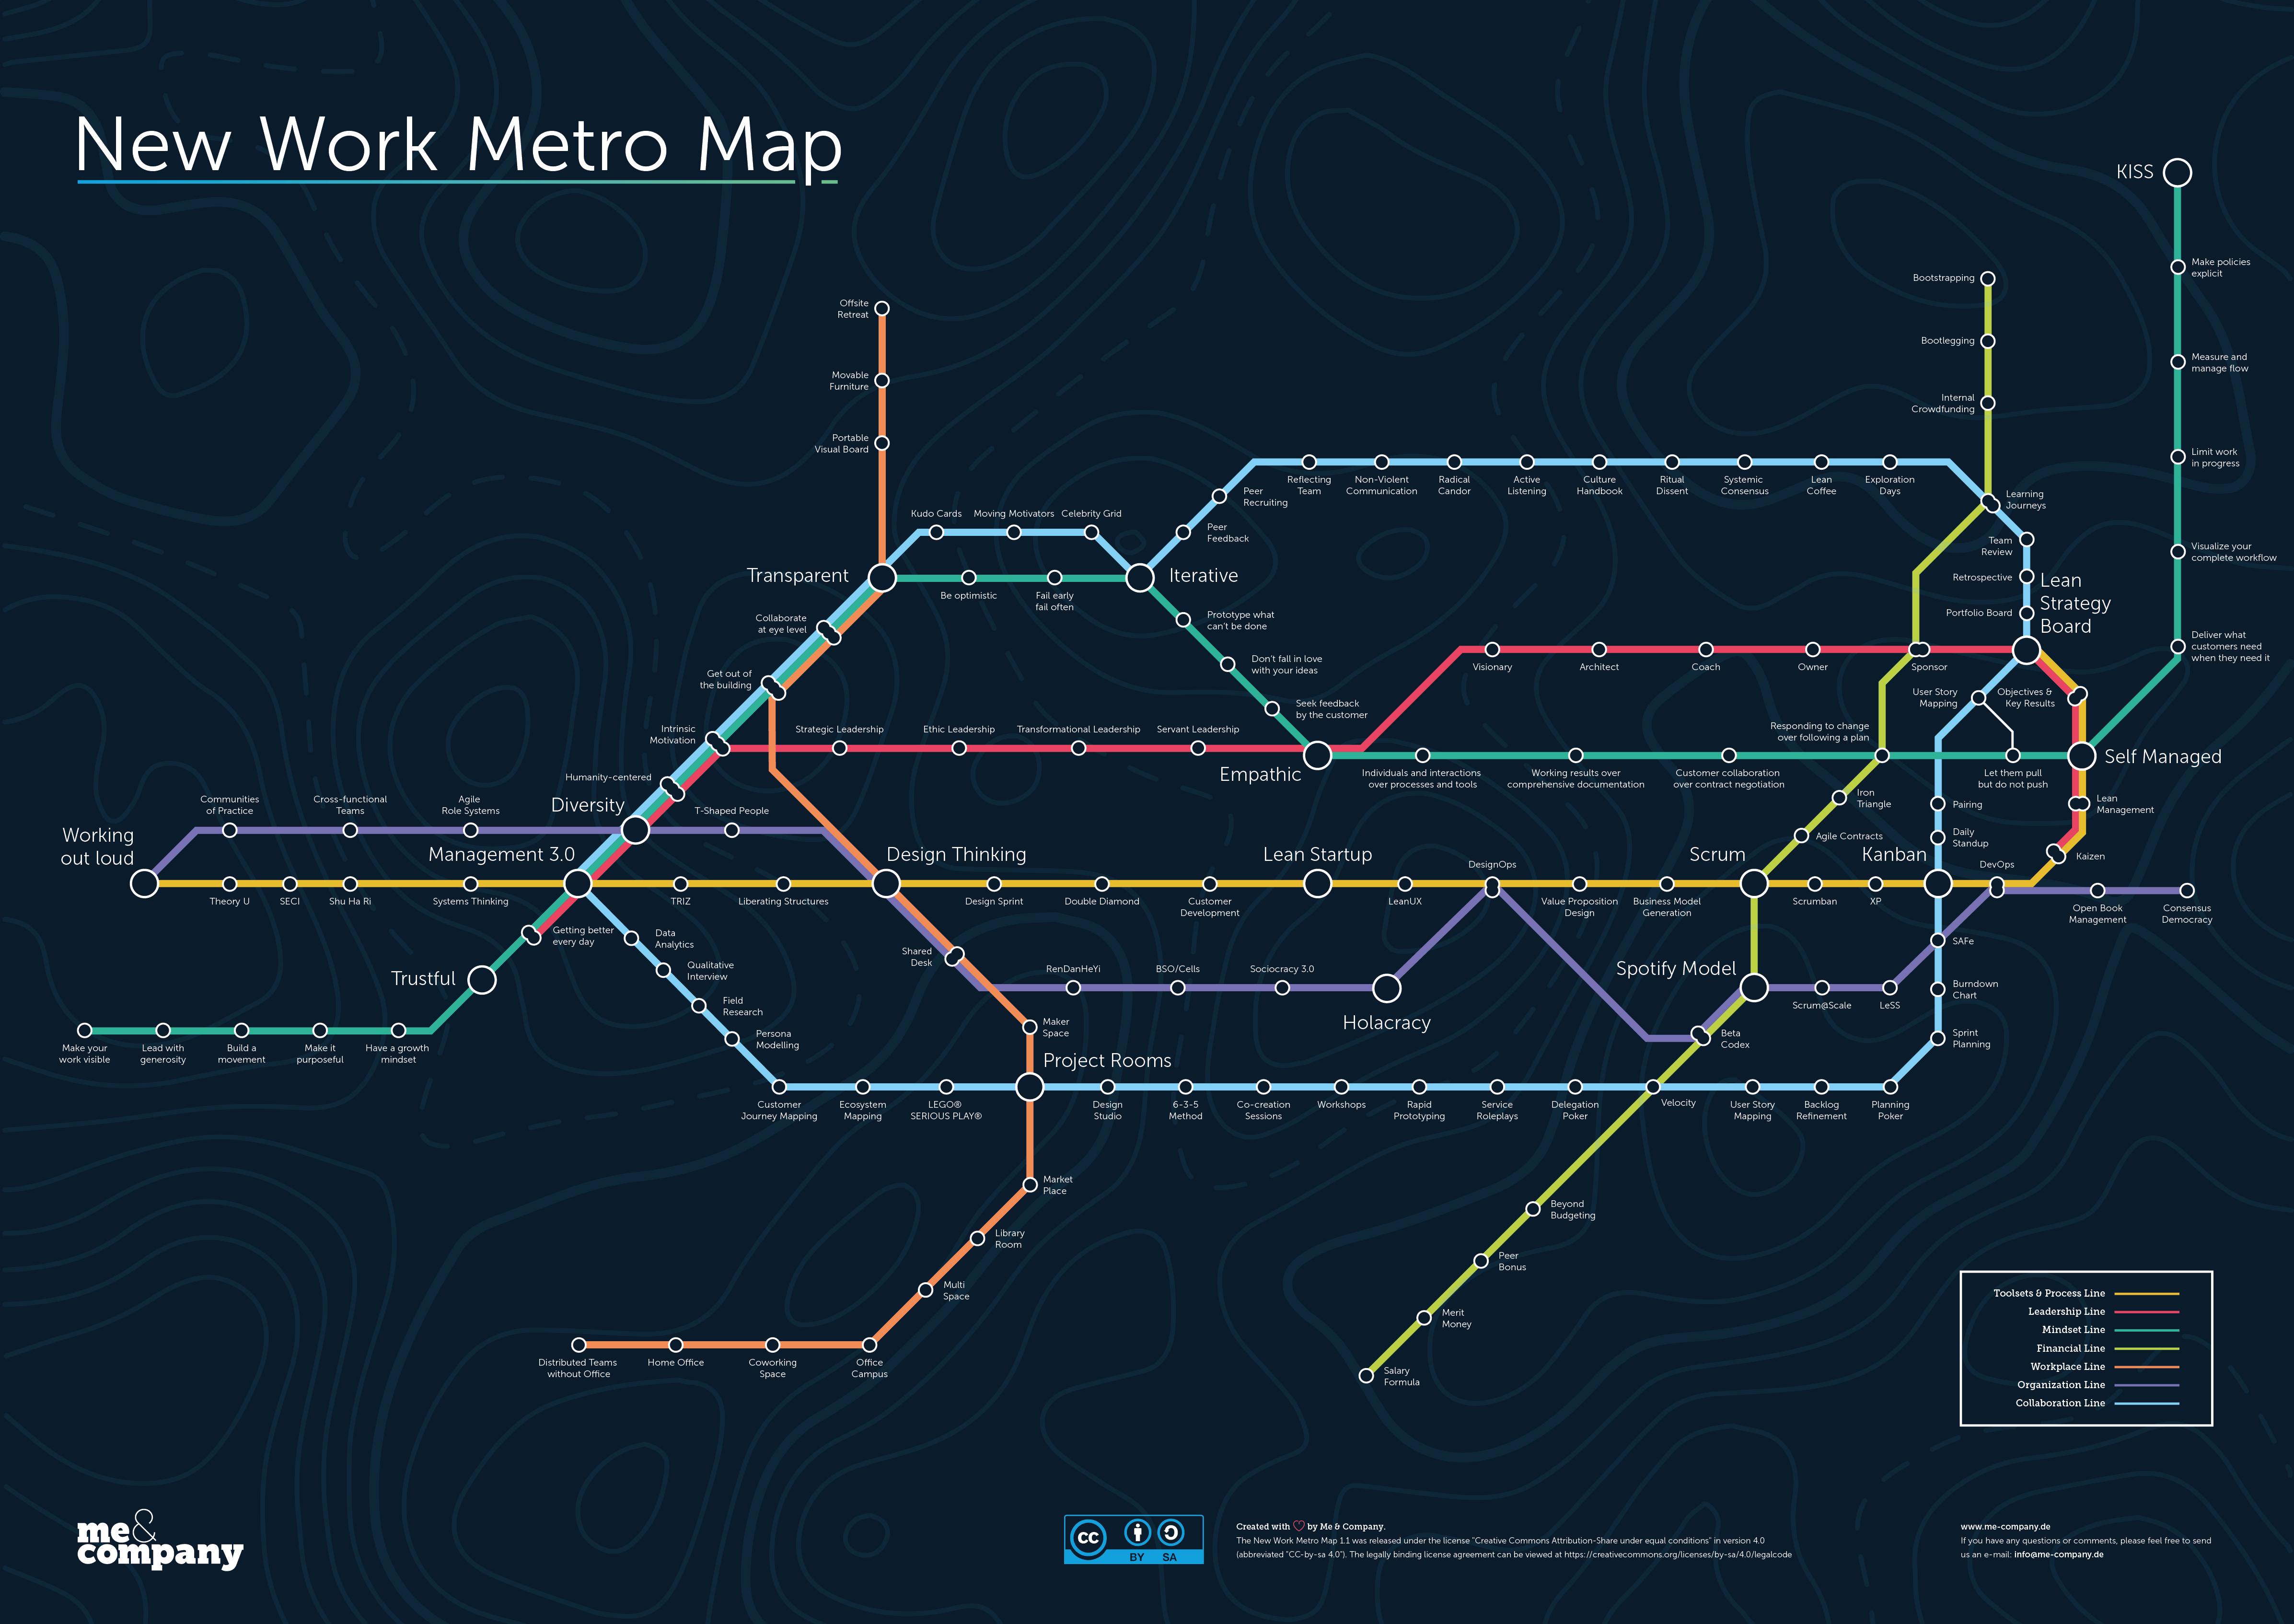 New Work Metro Map - Agile Arbeit im Überblick